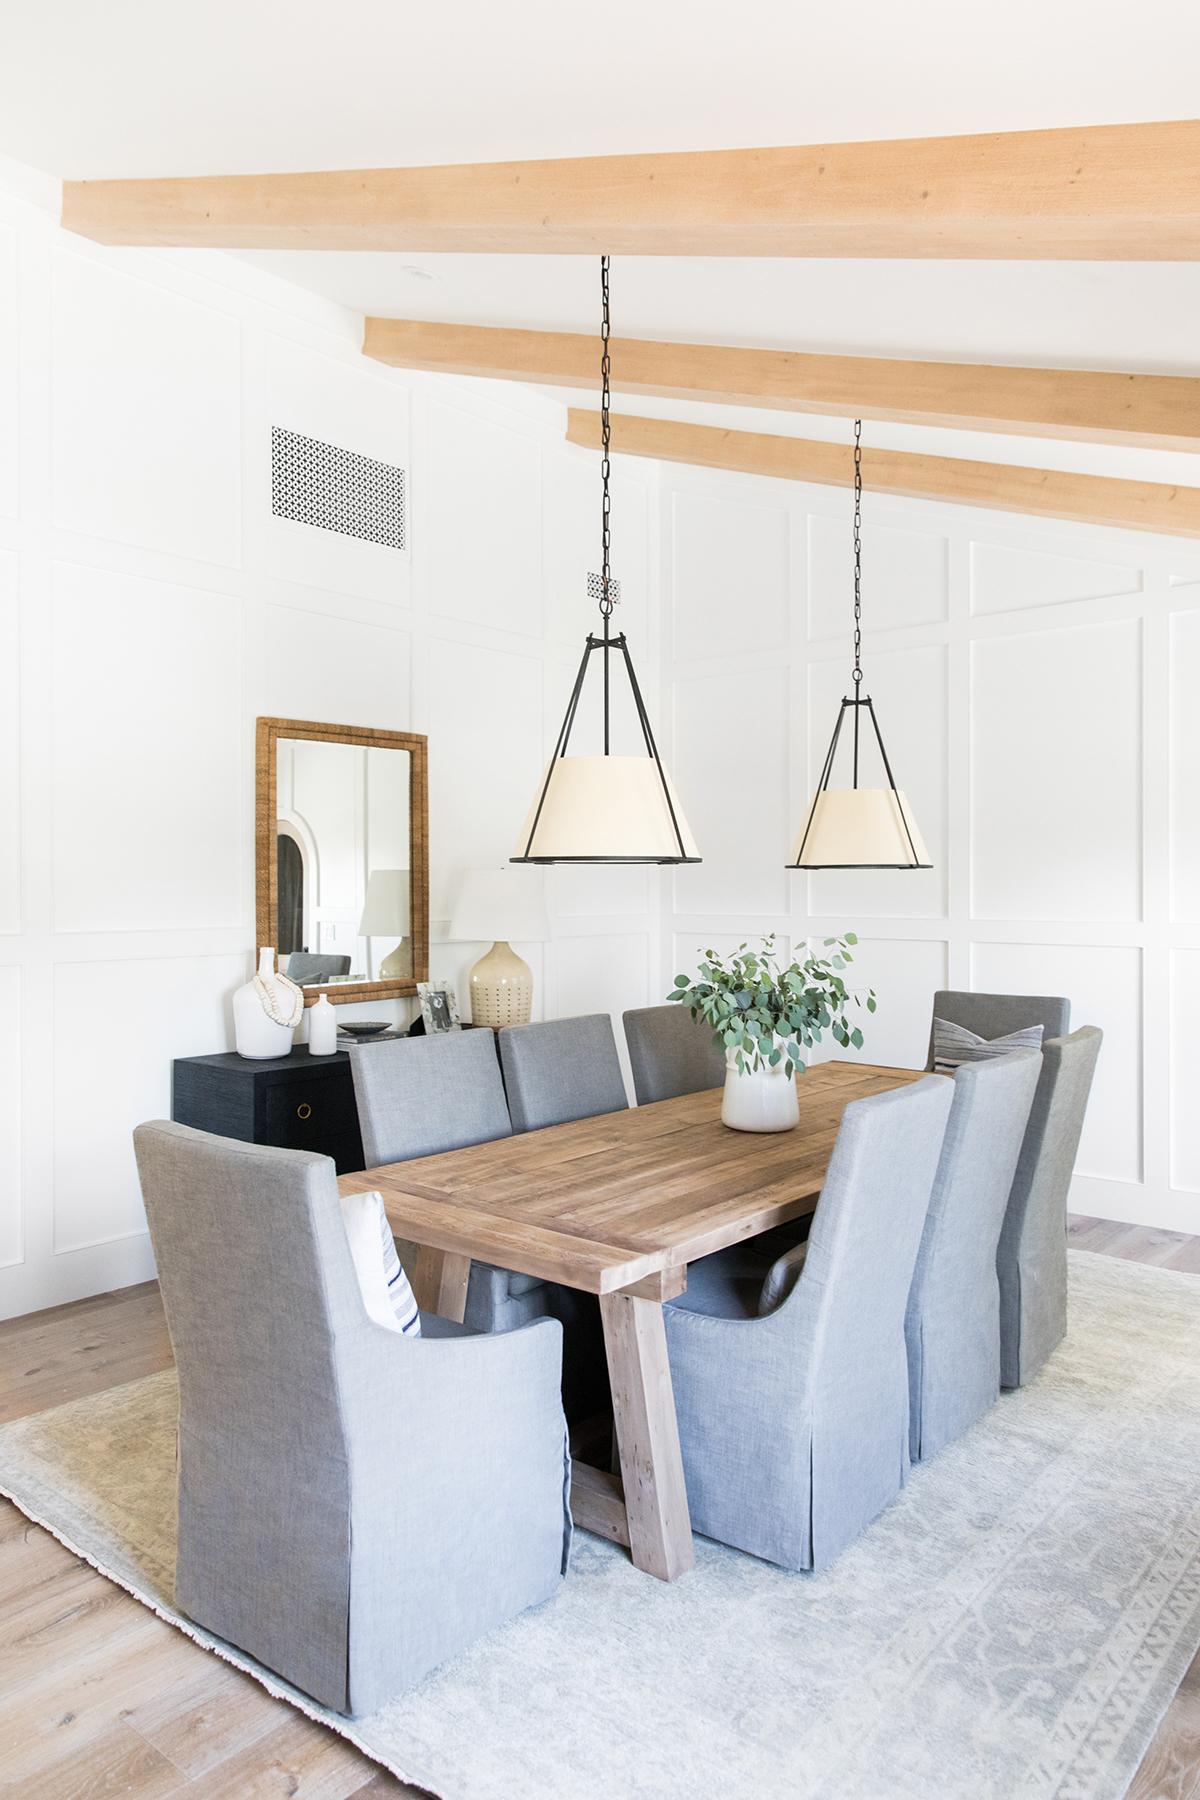 Dining+Room+_+Natural+Beams.jpg